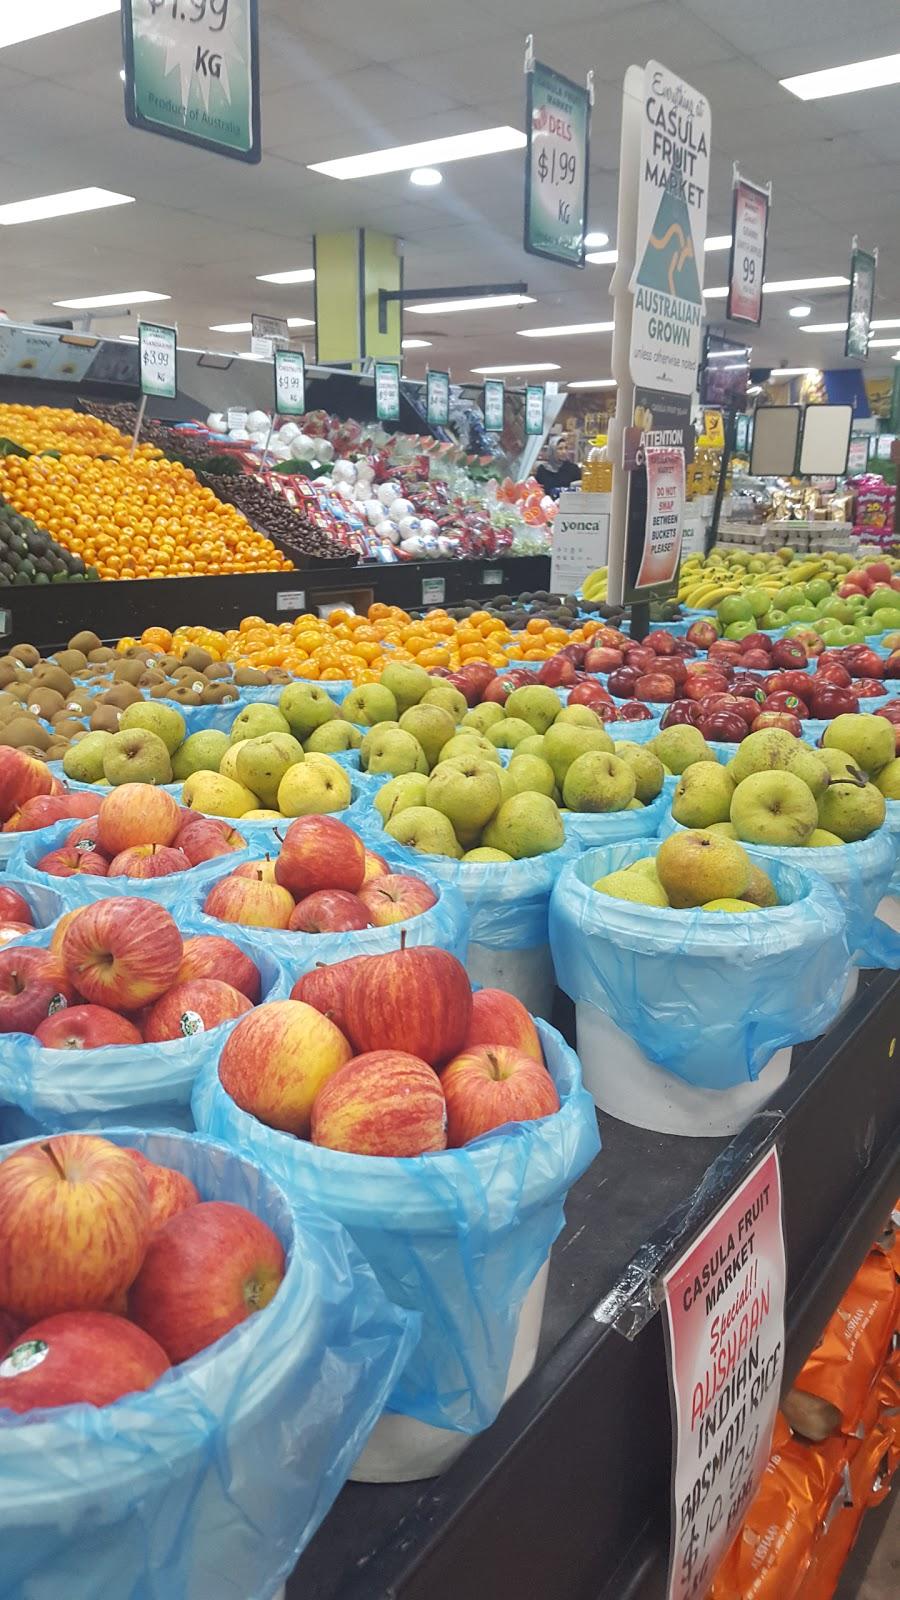 Casula Fruit Market | store | 11/493-509 Hume Hwy, Casula NSW 2170, Australia | 0296010005 OR +61 2 9601 0005